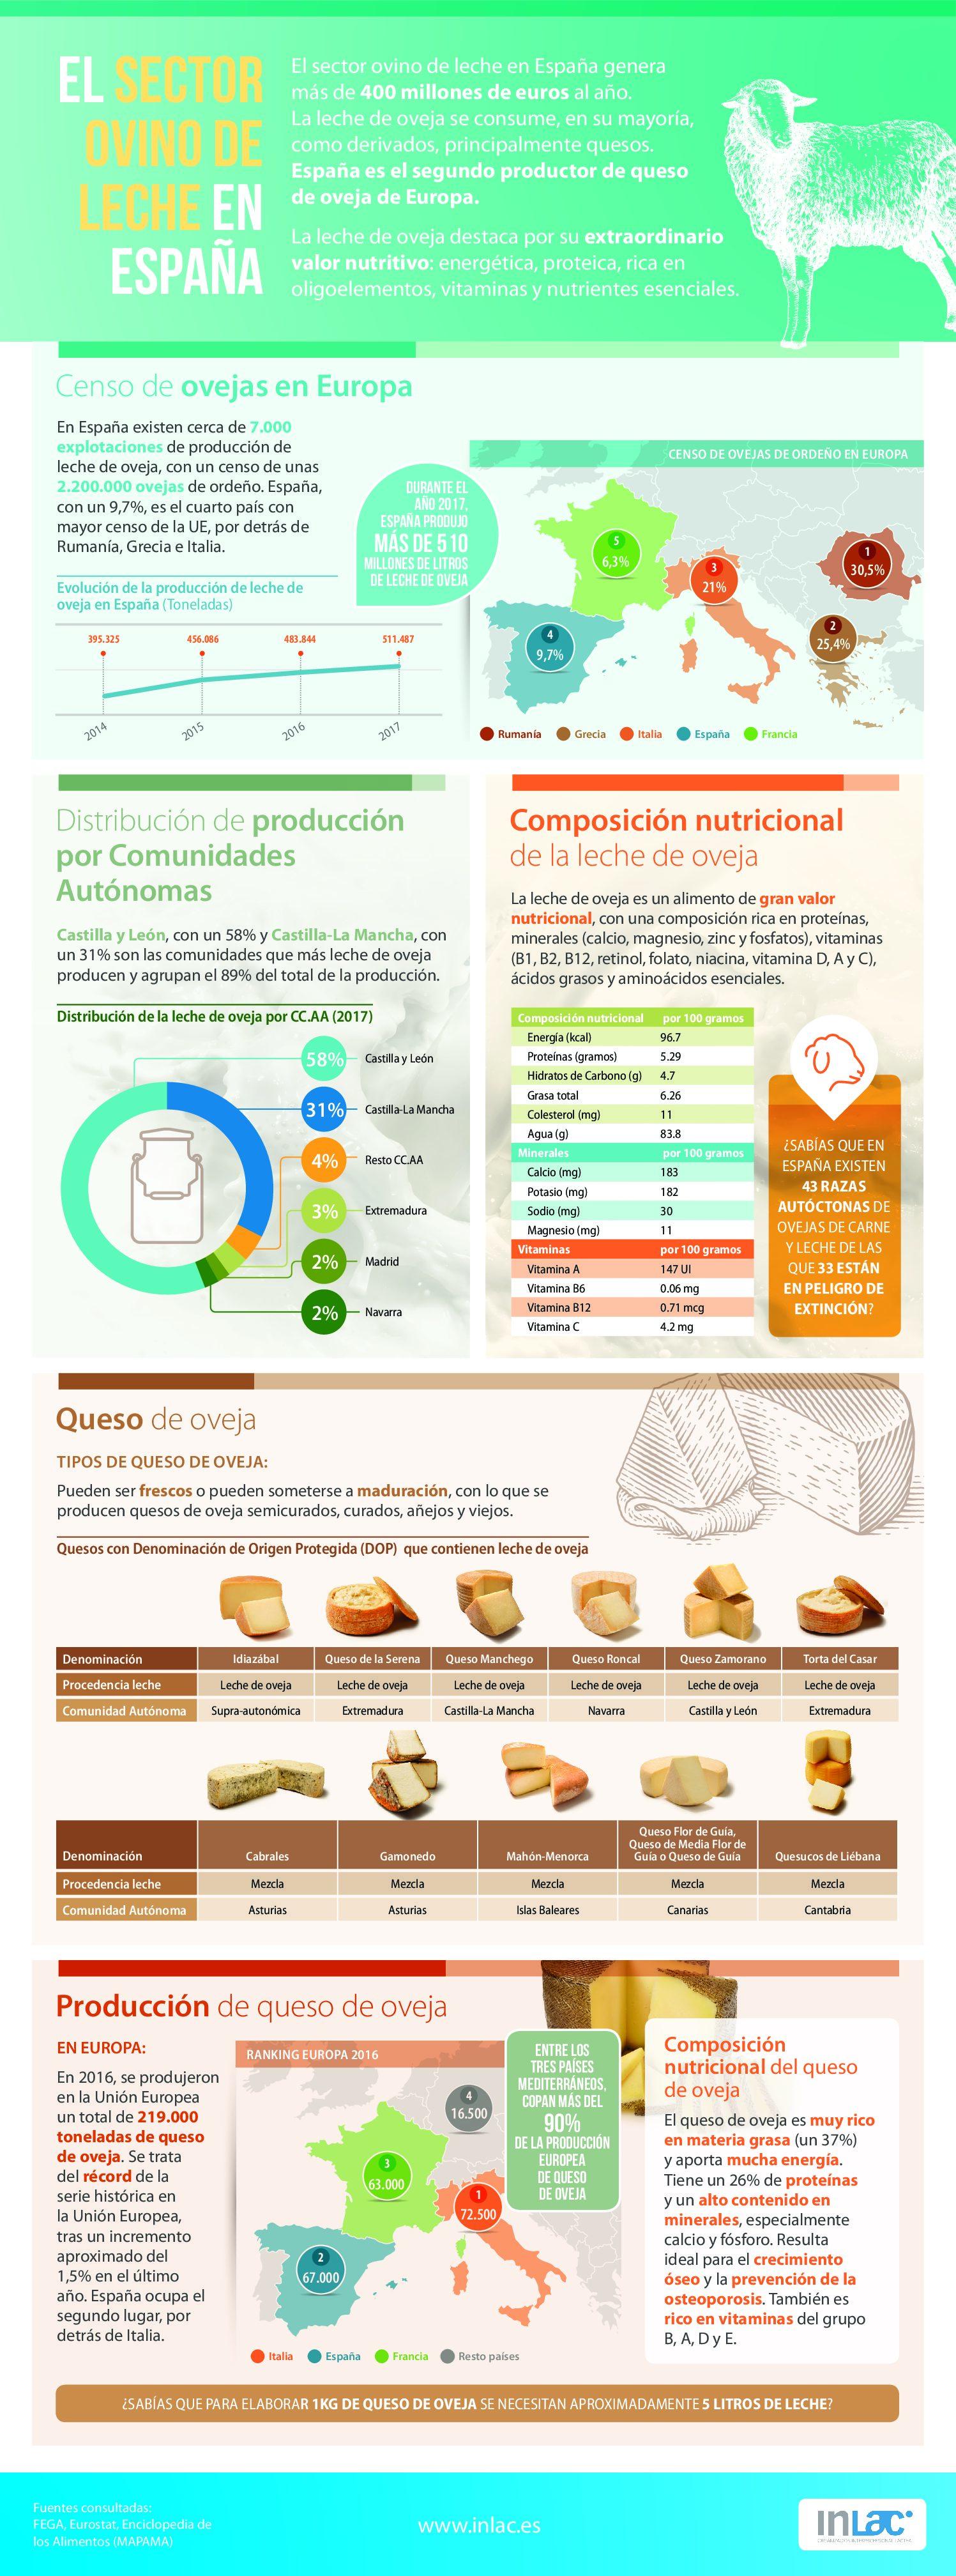 El sector OVINO DE LECHE en España